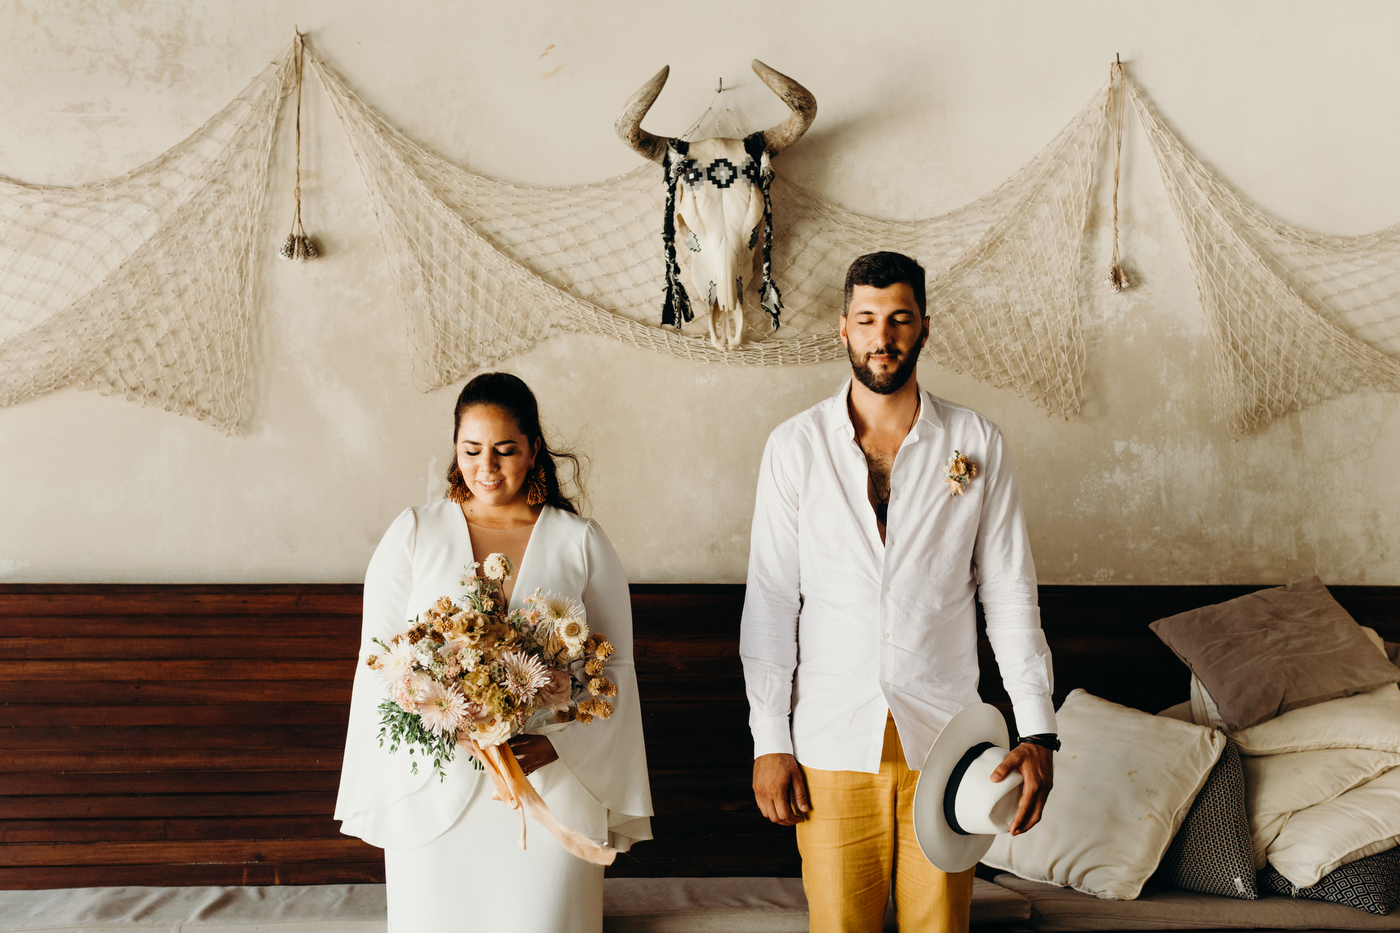 Daniela & Ehsy's Wedding at Mina Tulum